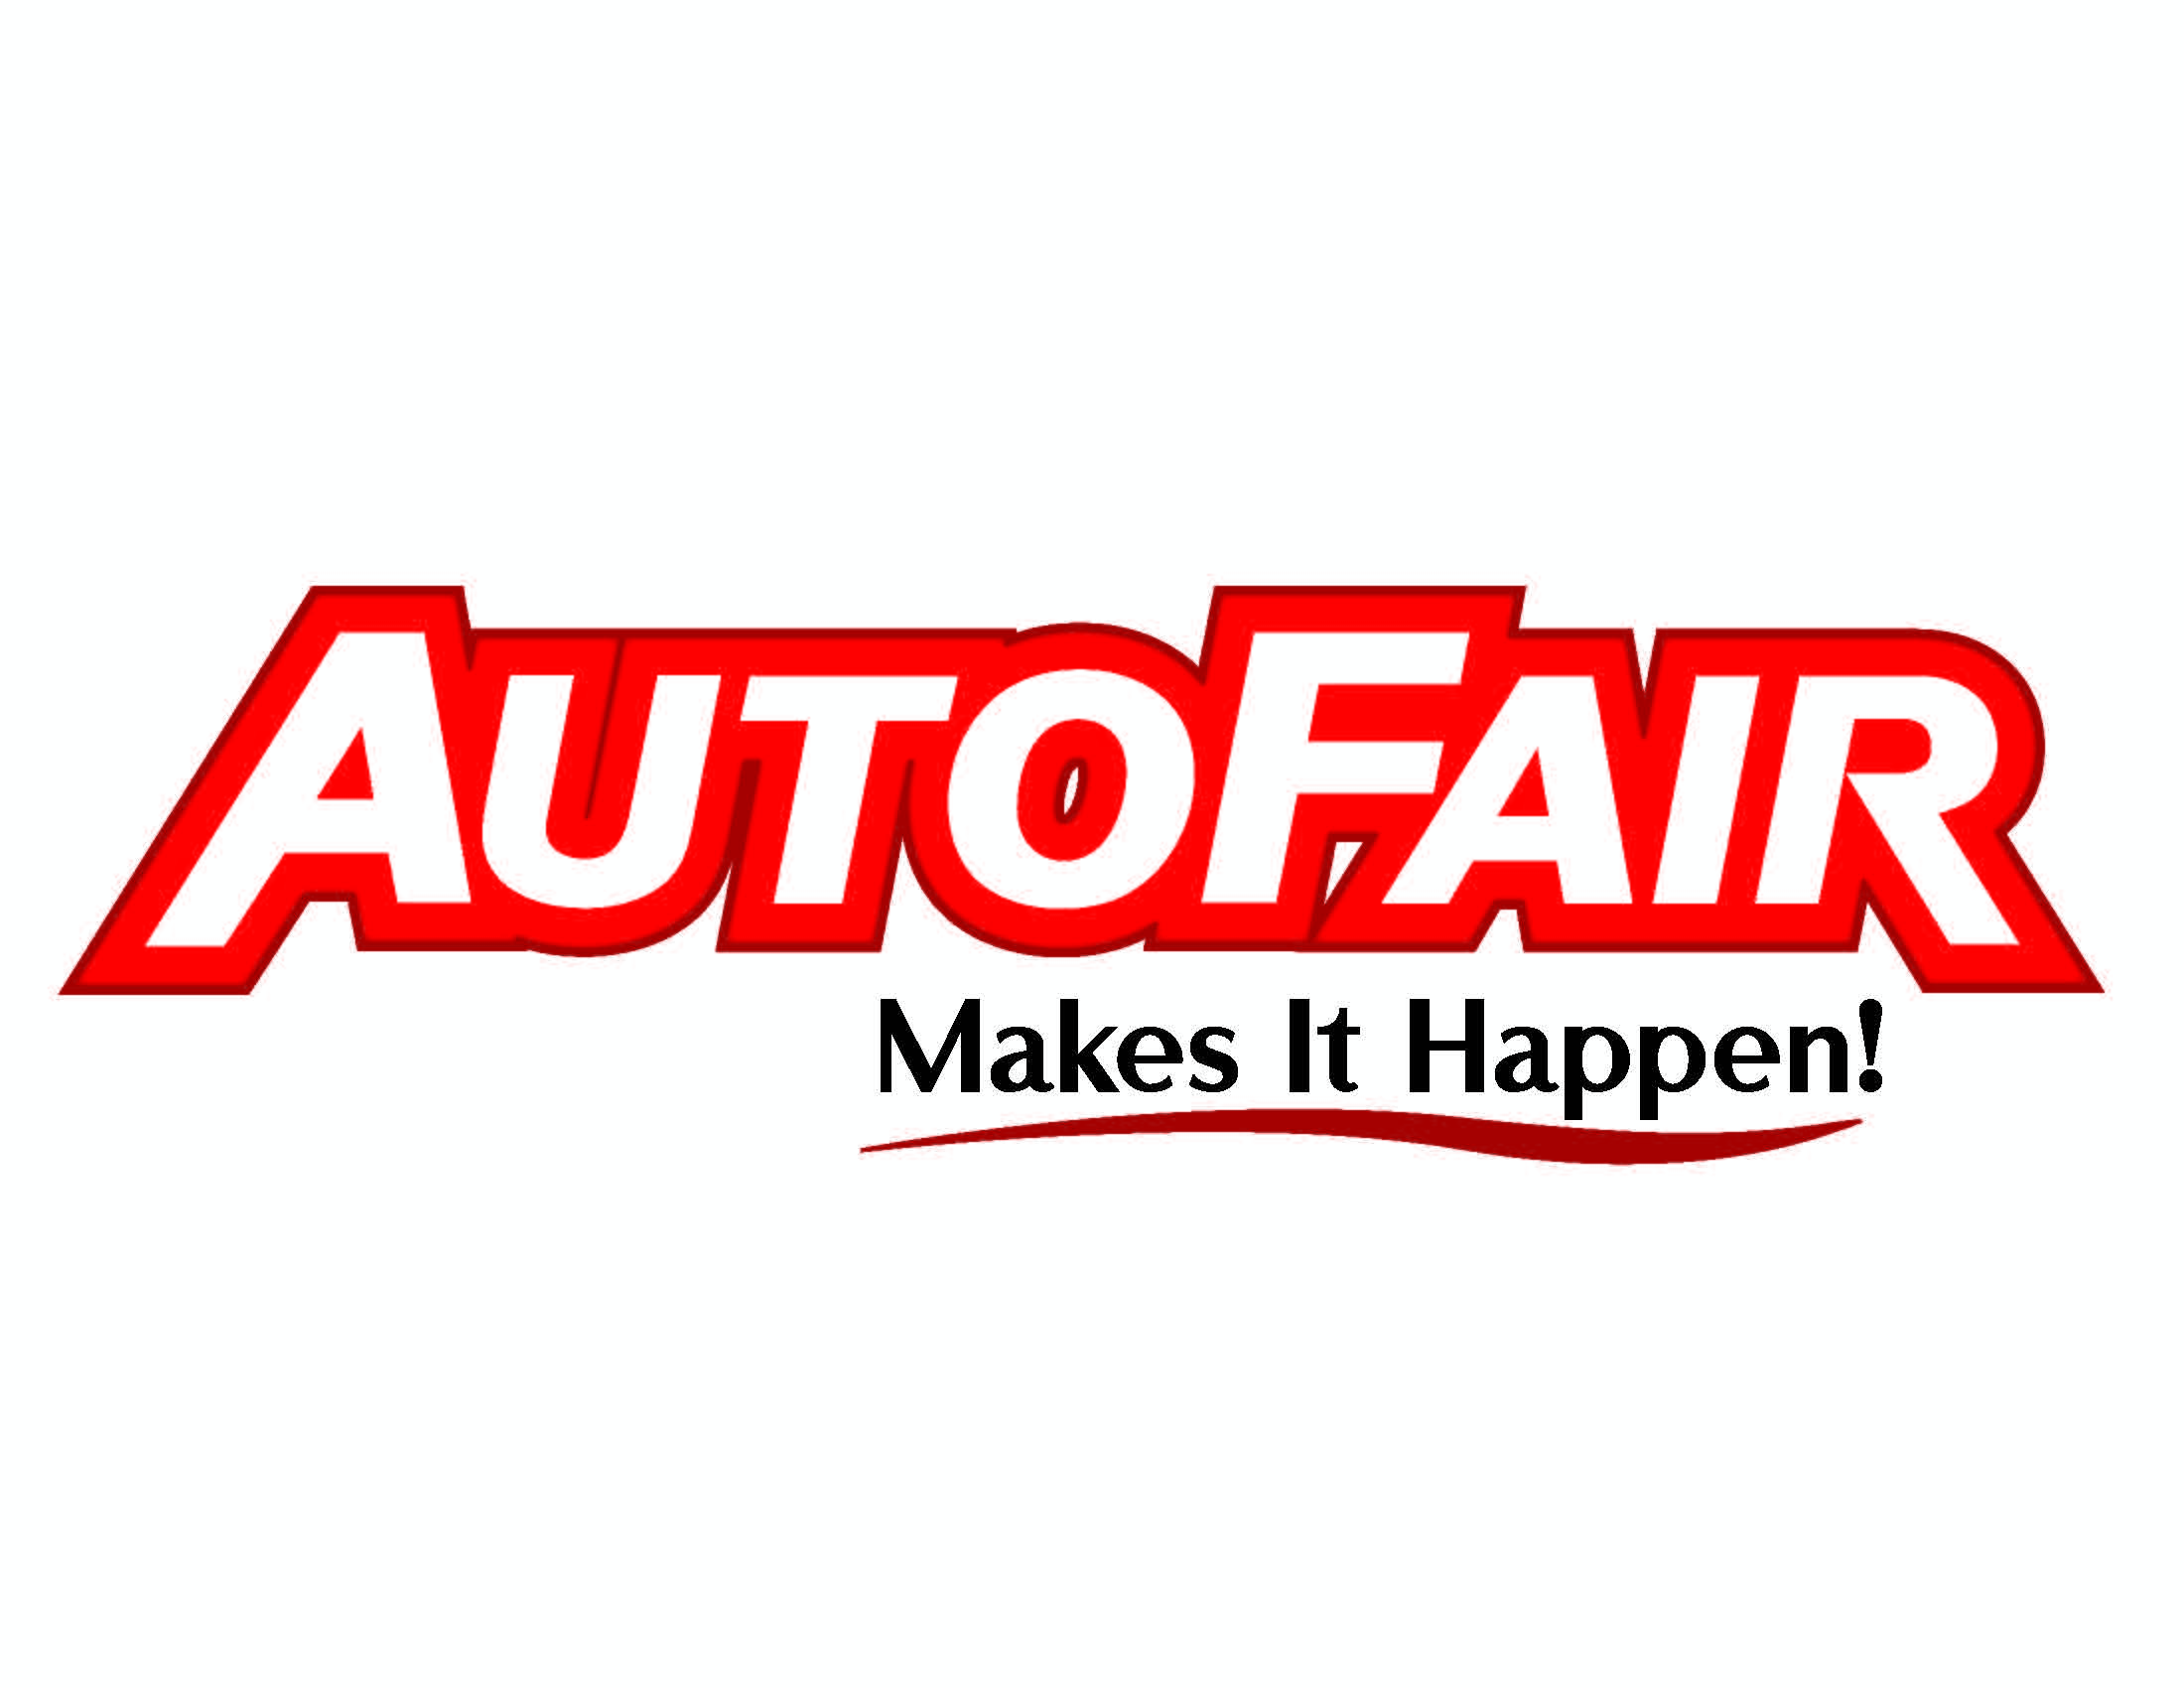 Autofair logo